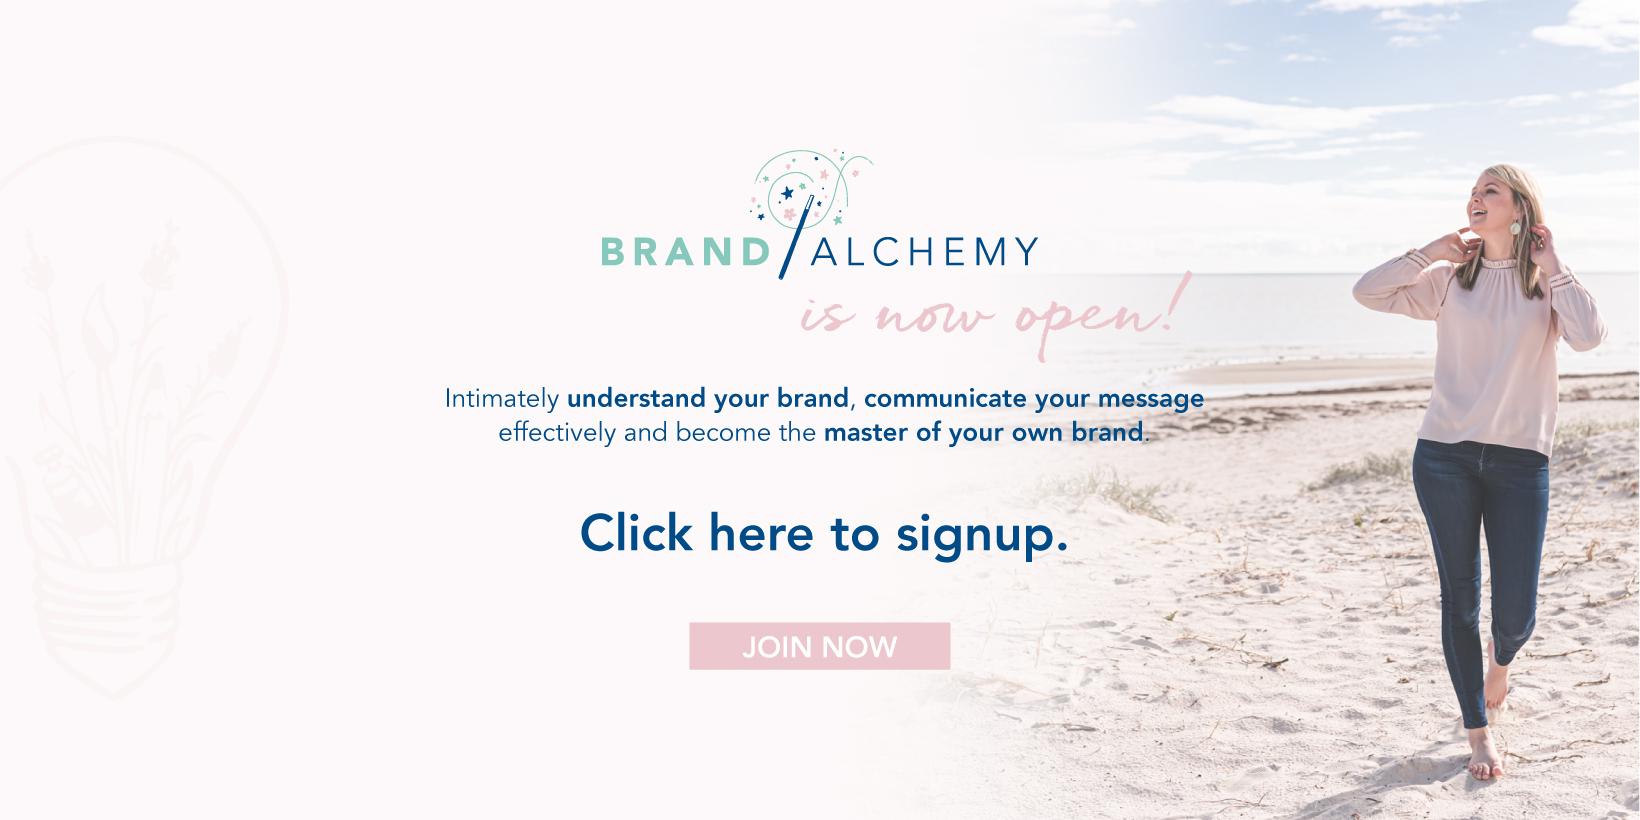 Join Brand Alchemy!